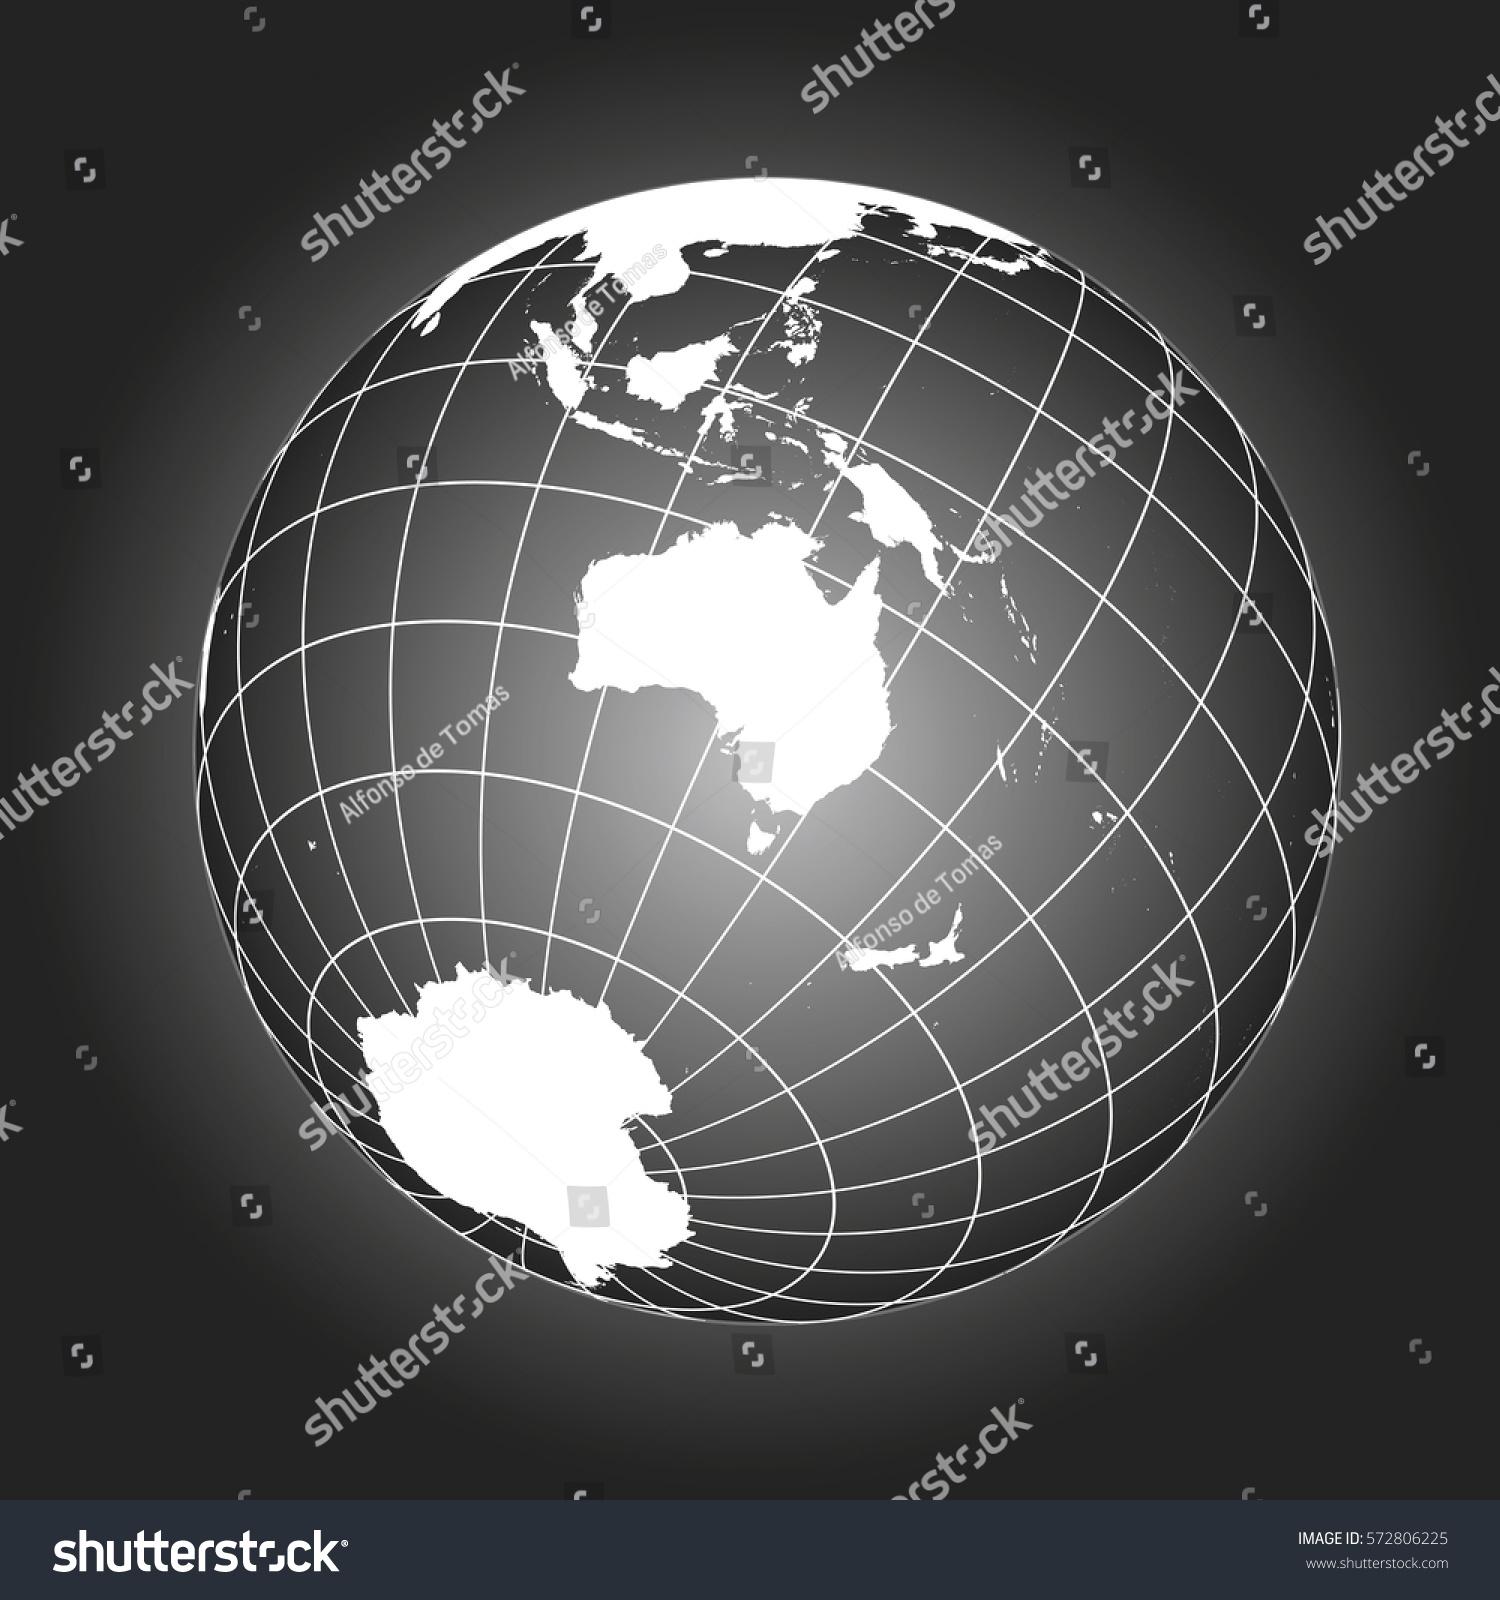 Australia oceania map australasia asia russia vectores en stock australia or oceania map australasia asia russia antarctica north pole gumiabroncs Choice Image